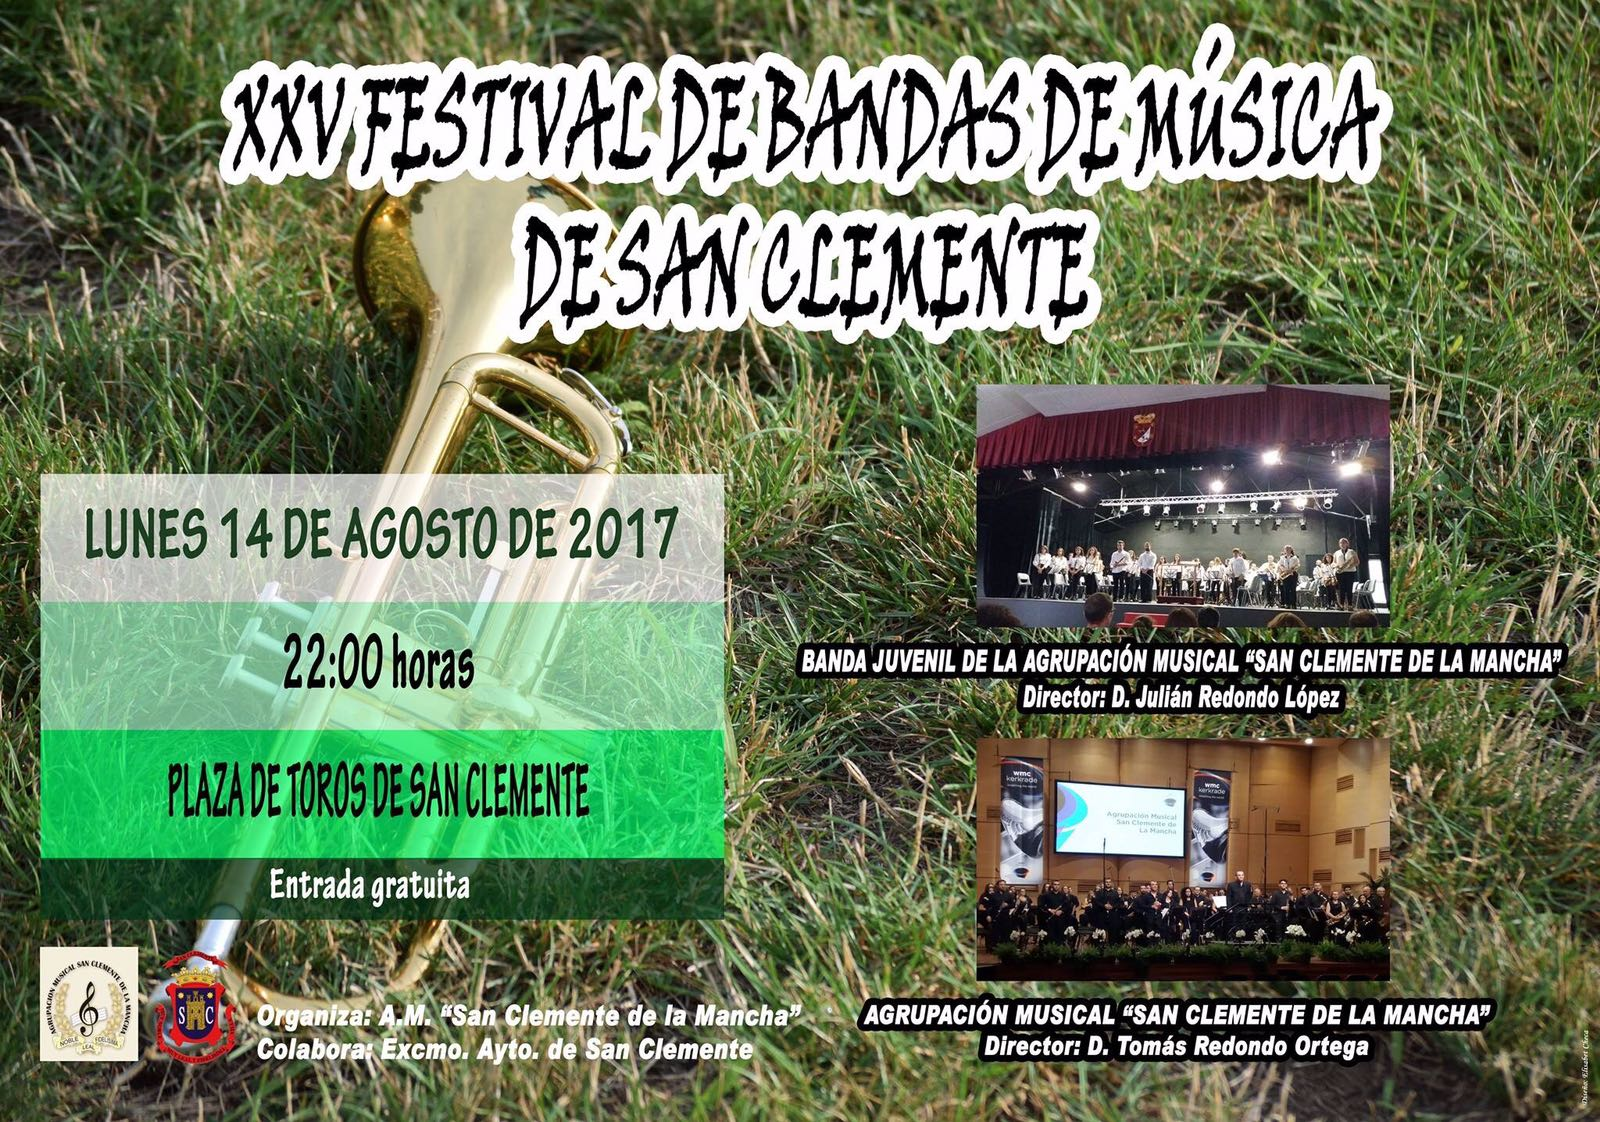 festival bandas musica